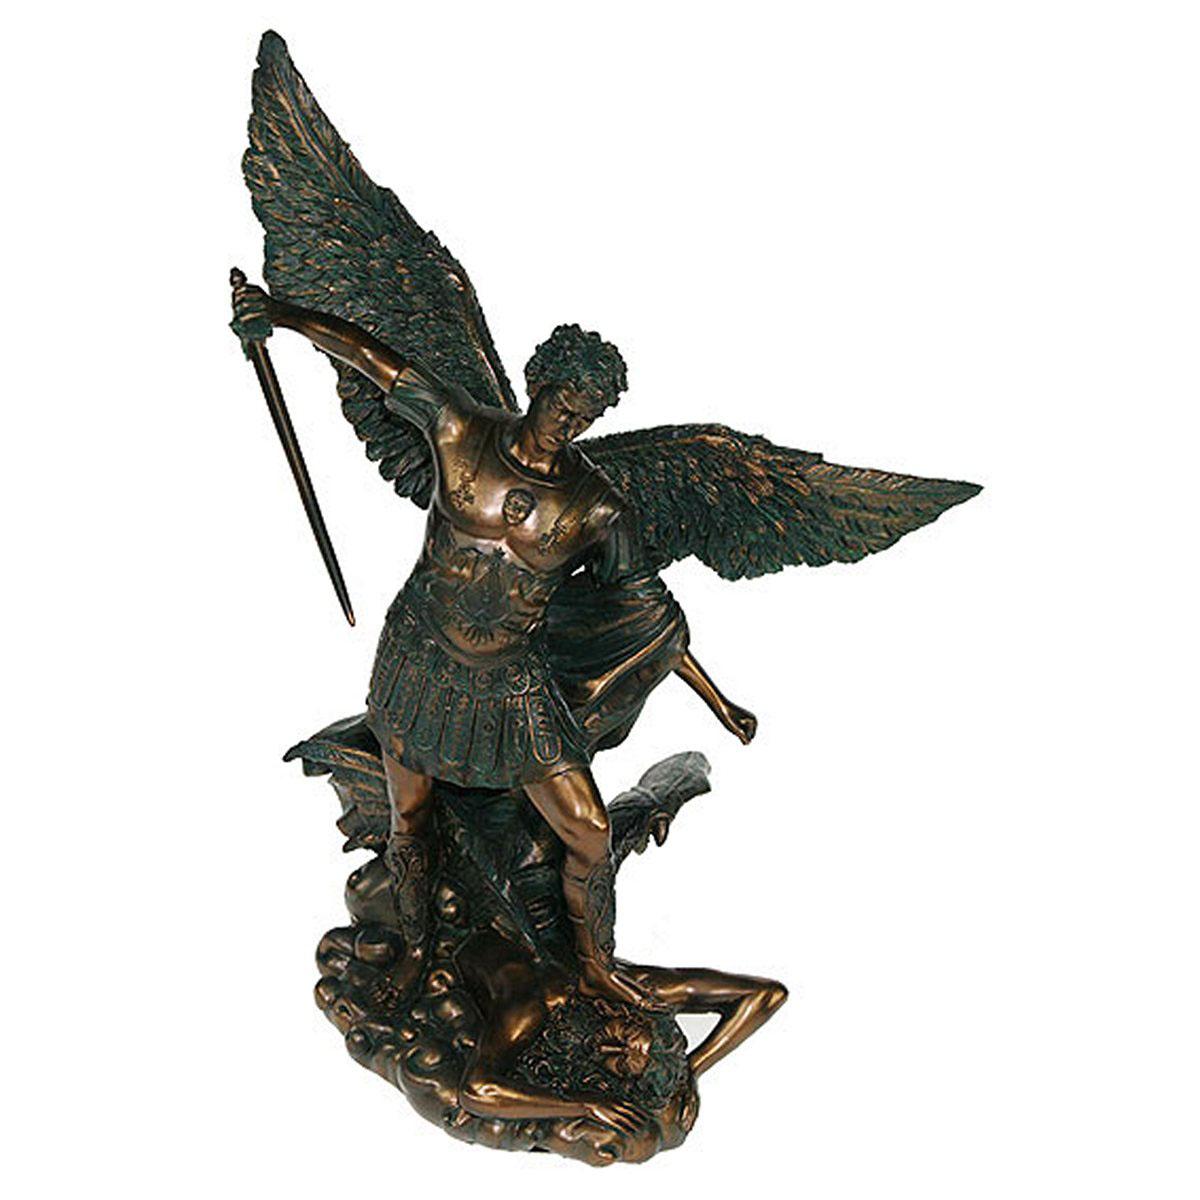 Статуэтка Русские Подарки Архангел Михаил, 24 х 29 см статуэтка русские подарки африканка 6 х 11 х 20 см